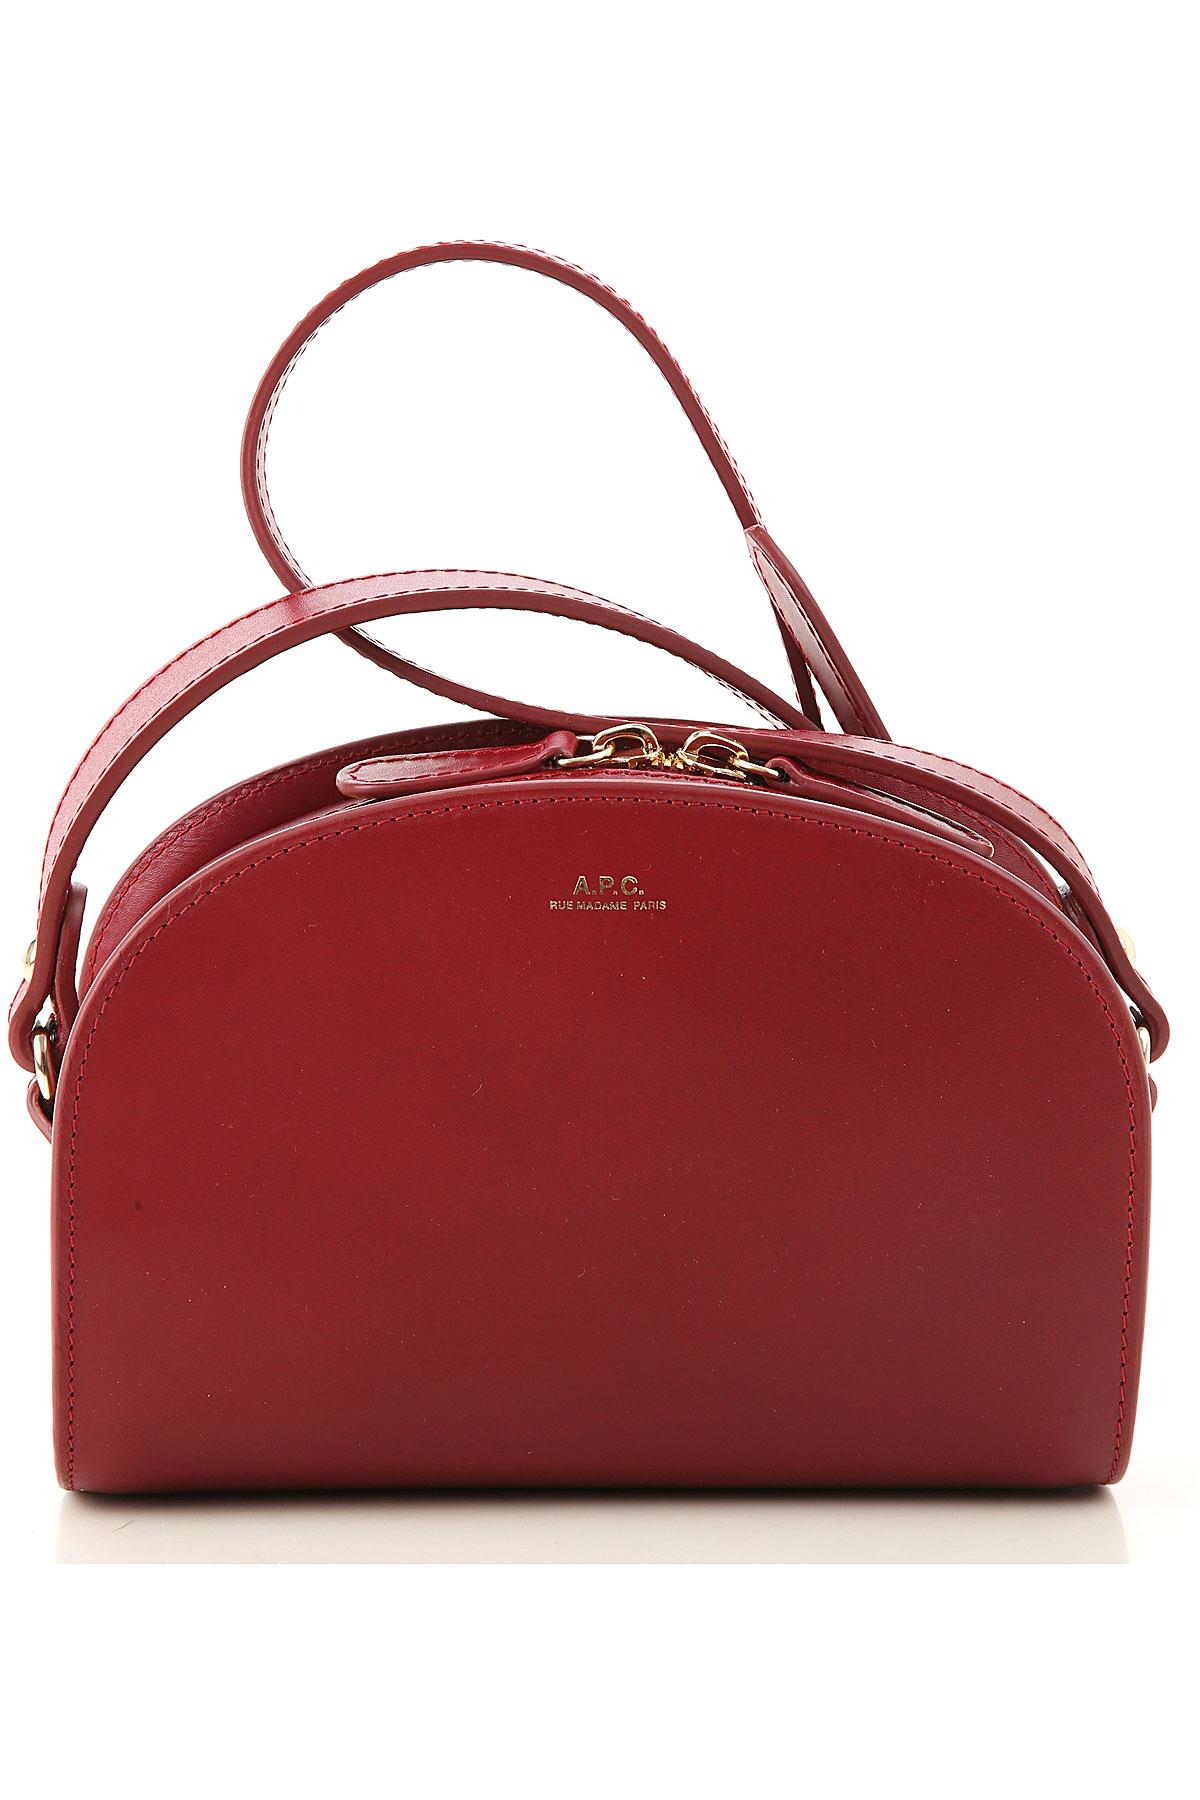 A.P.C Shoulder Bag for Women On Sale, Grenade Red, Leather, 2019